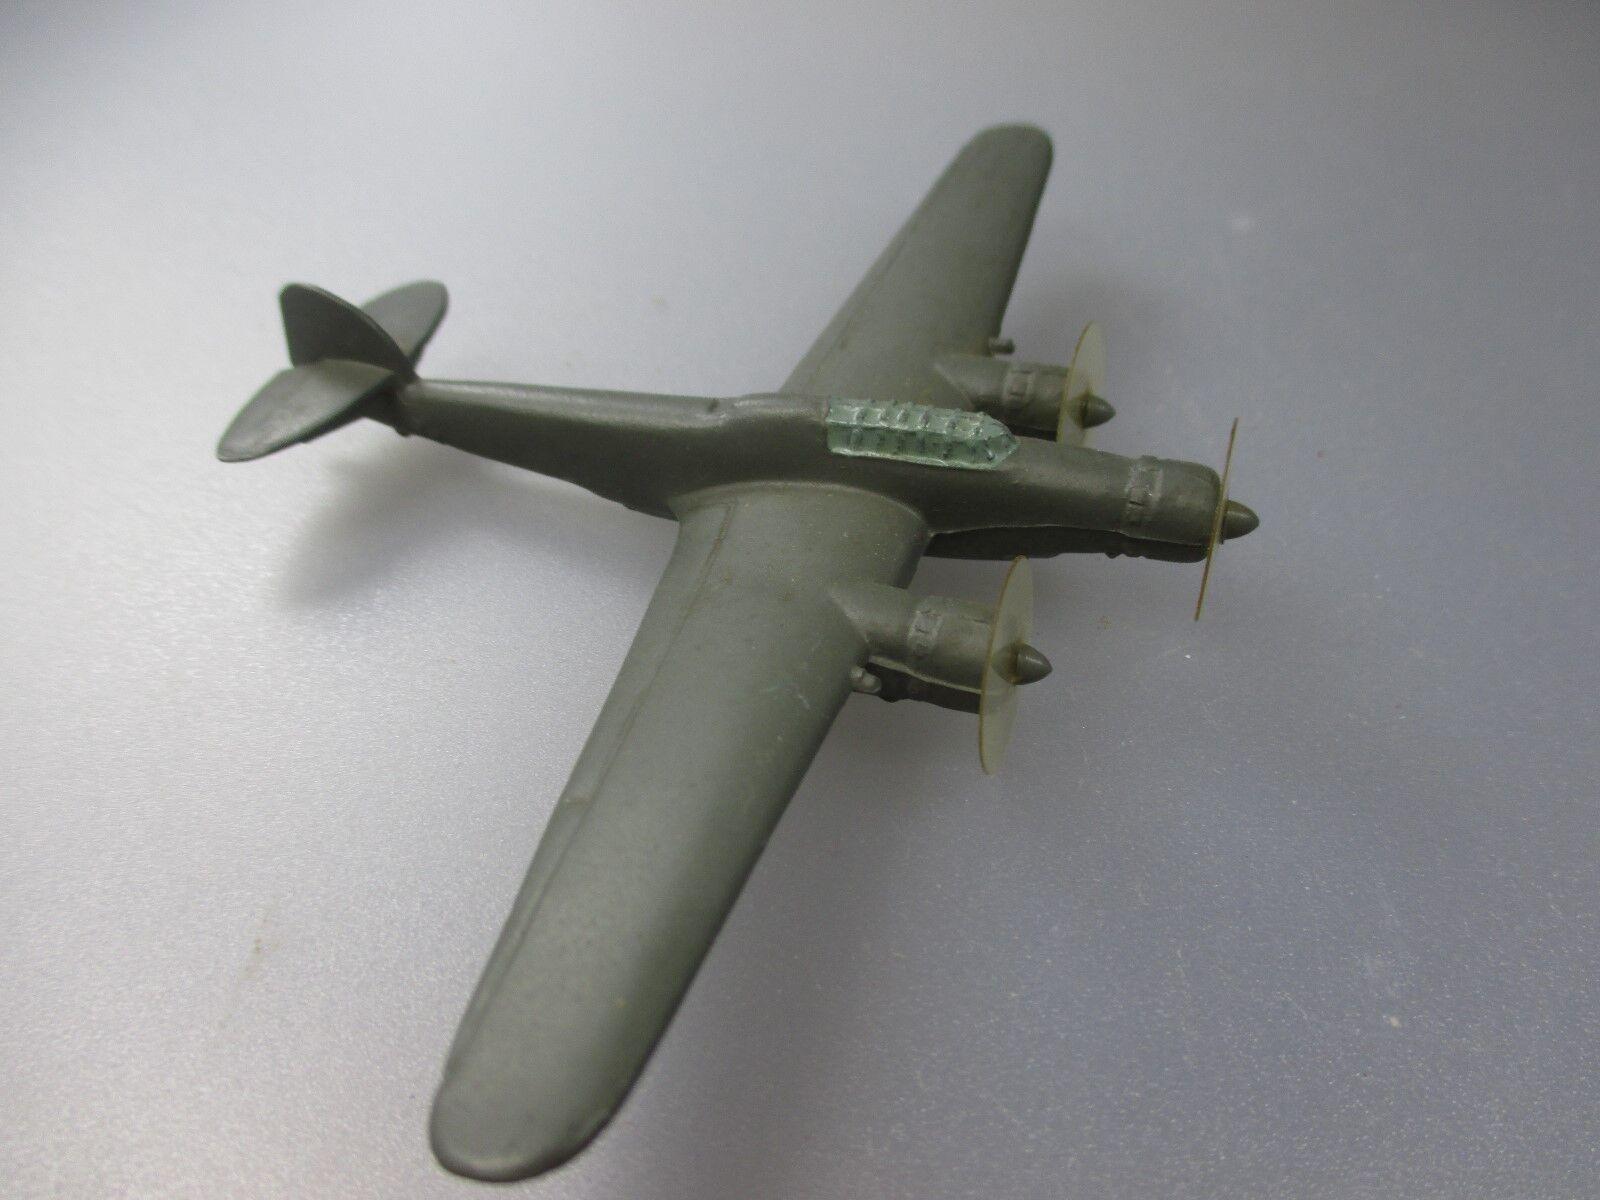 Wiking Wiking Wiking  avion Italie, i8, Cant Z 1007, haut laqué (ssk31) 637b25